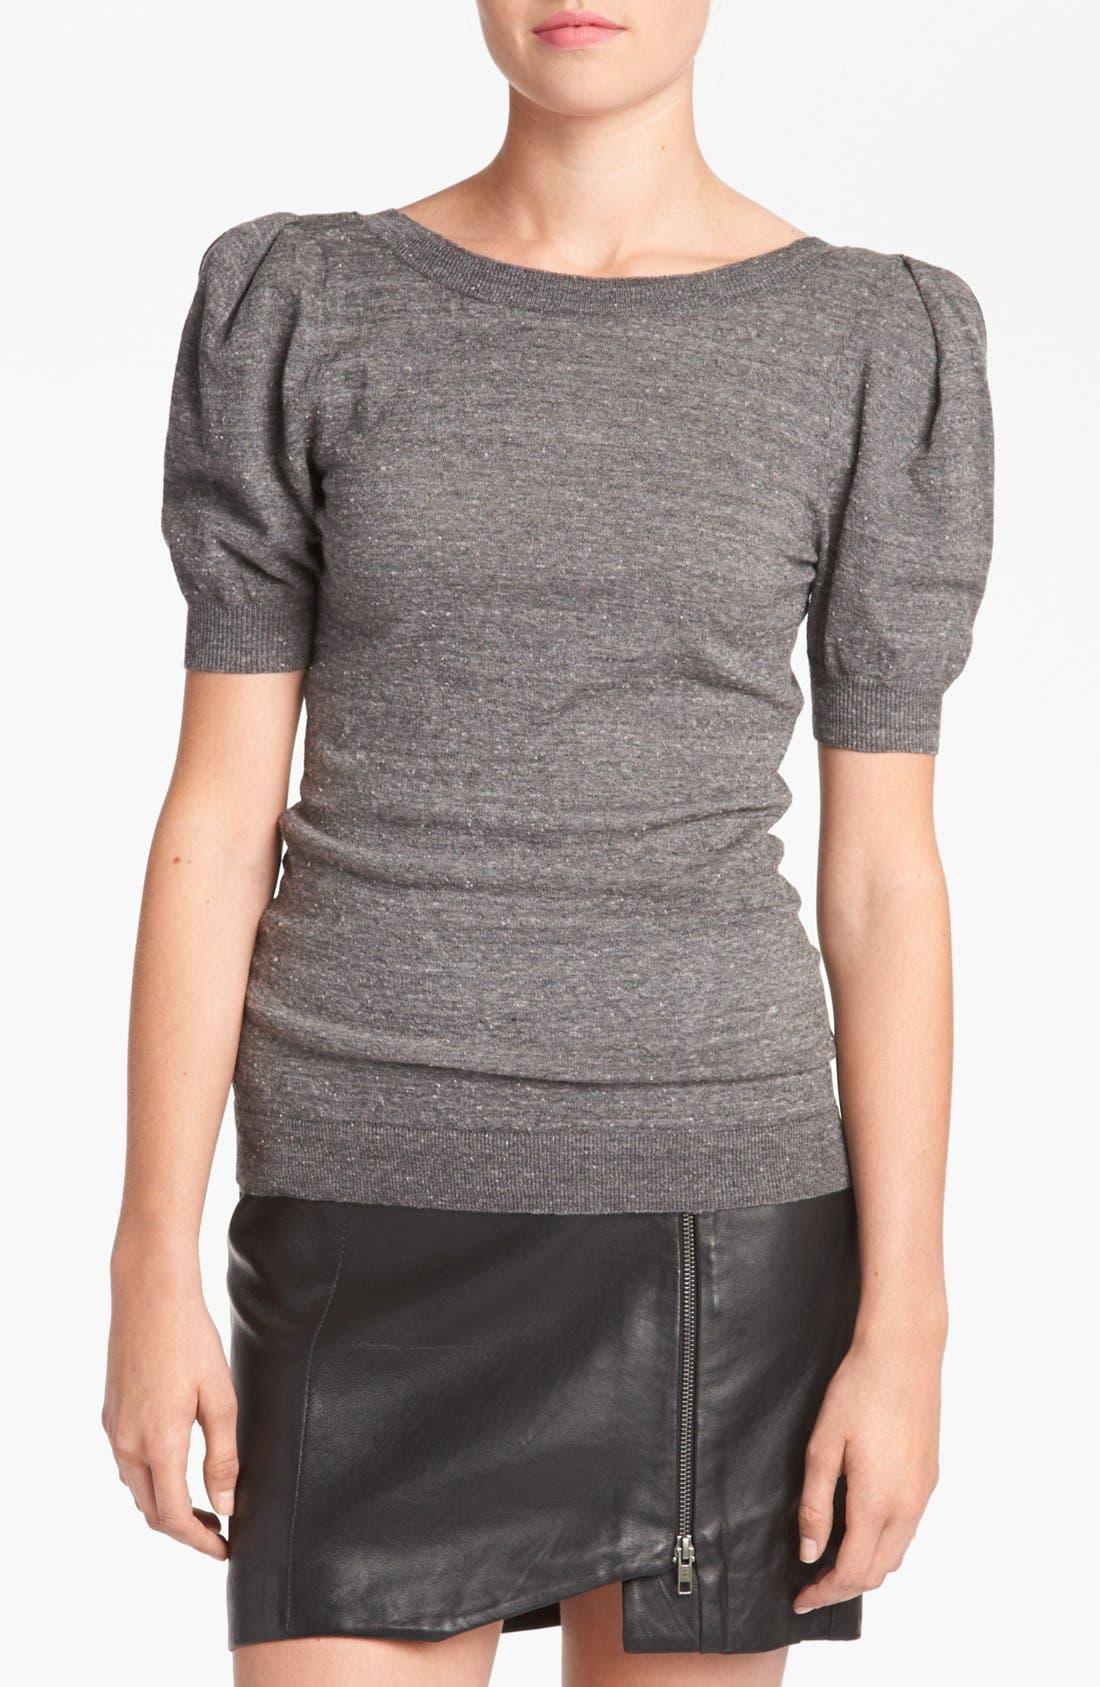 TILDON Short Puff Sleeve Top, Main, color, 030